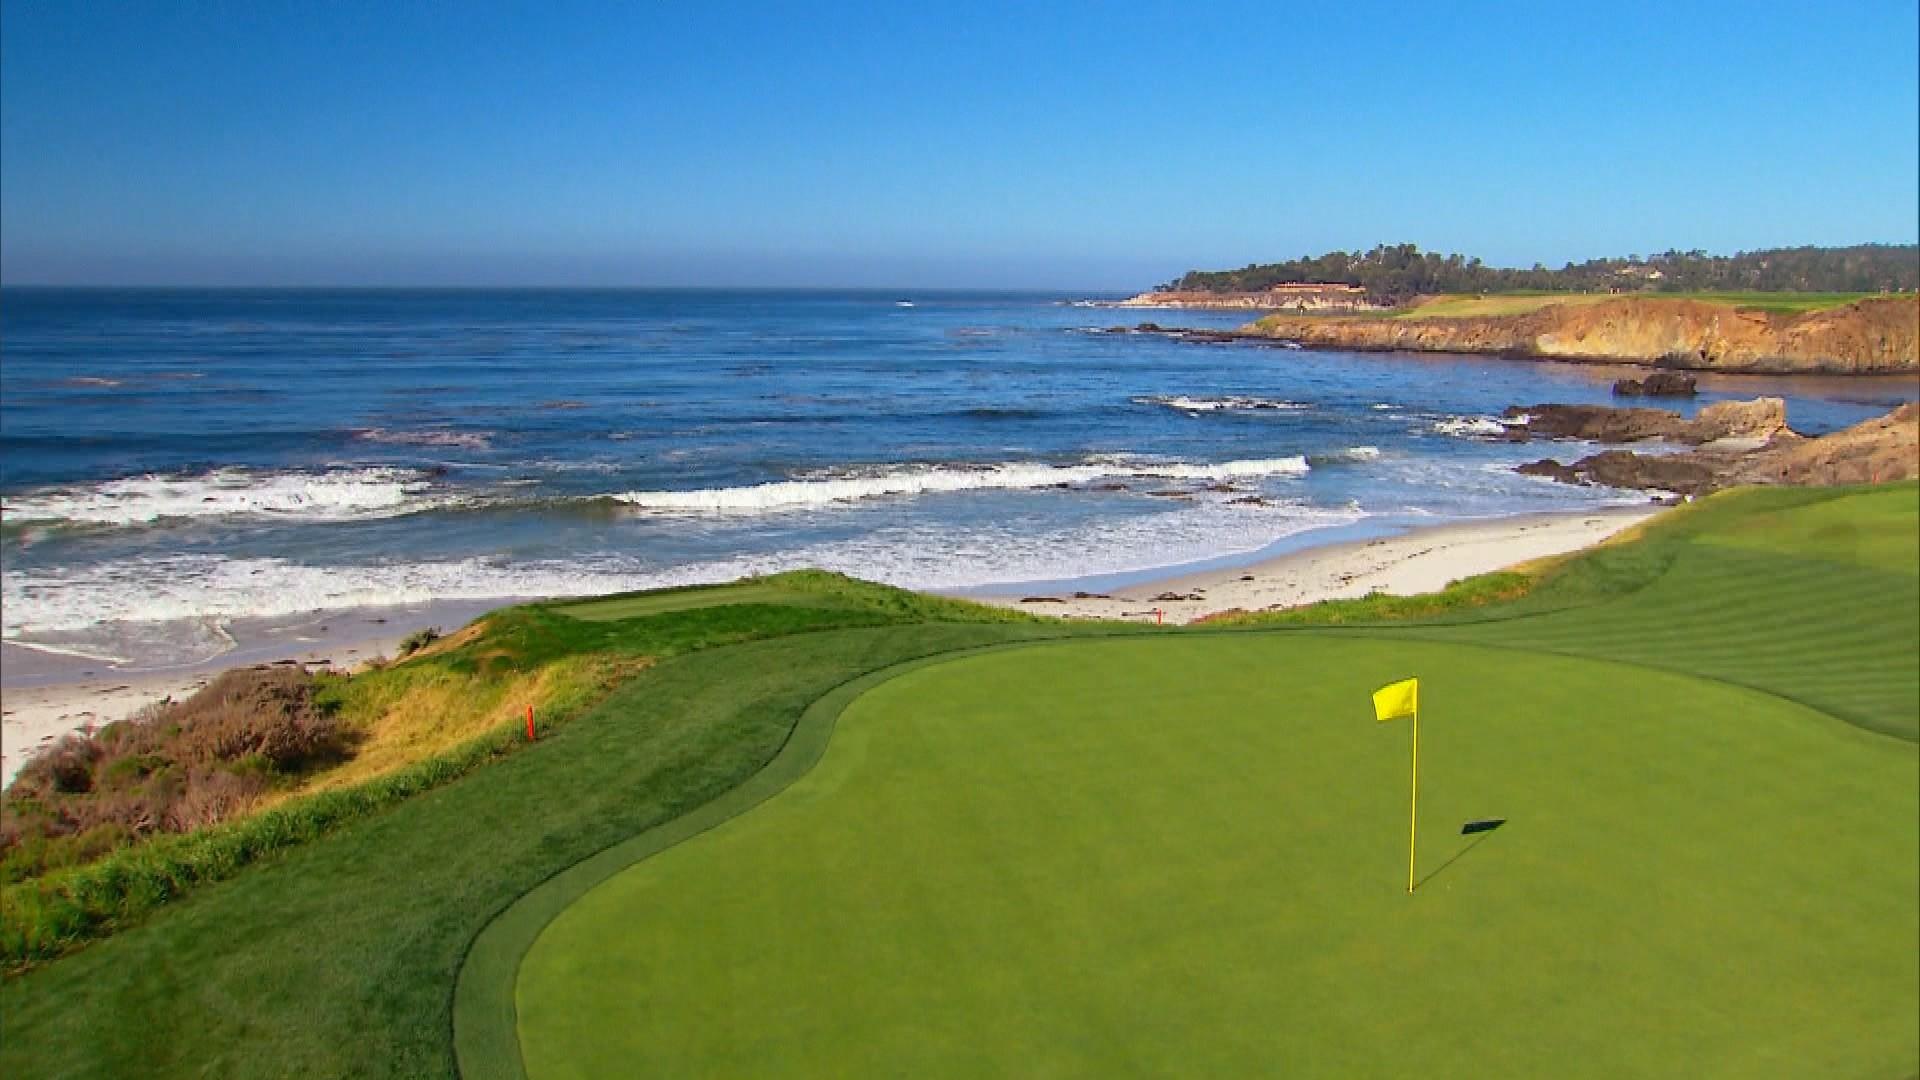 Golf Course Pics Wallpaper (62+ Images